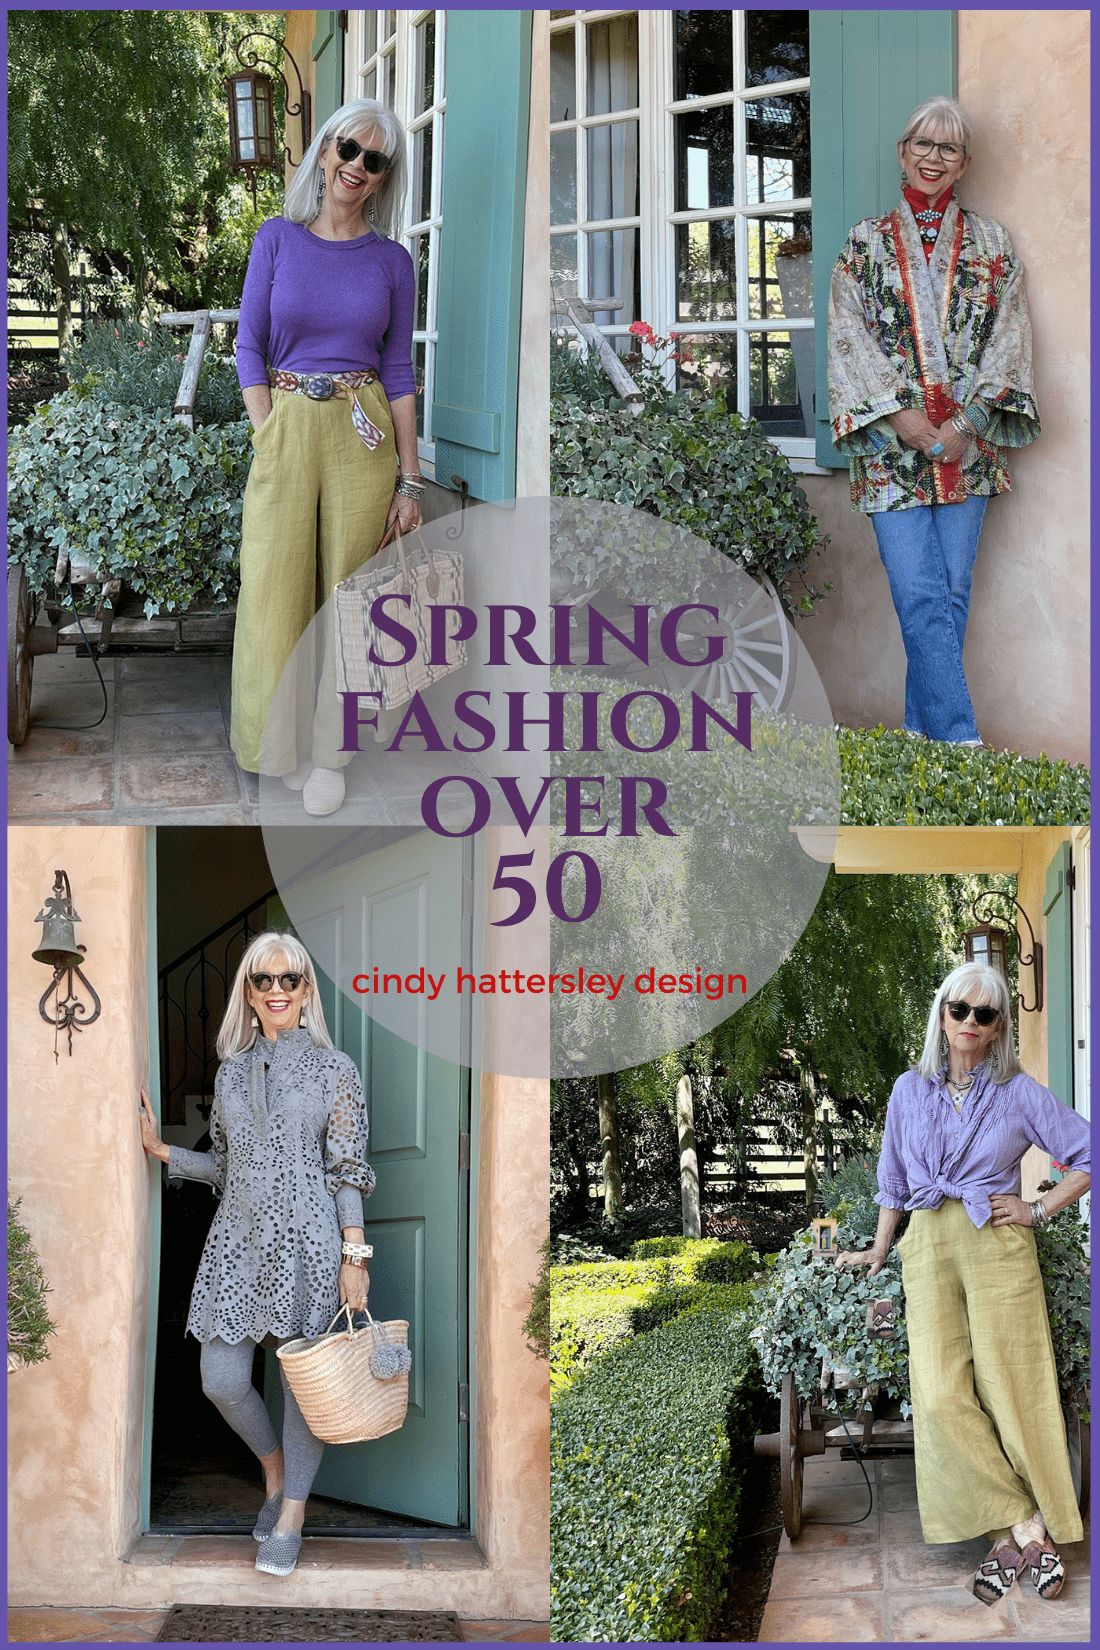 Spring Fashion over 50 Cindy Hattersley Design